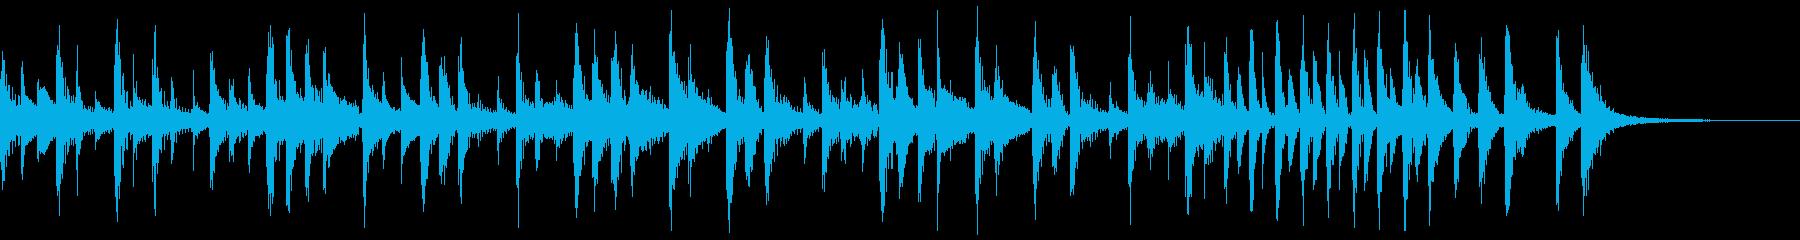 CON SALSA、低速から高速テ...の再生済みの波形